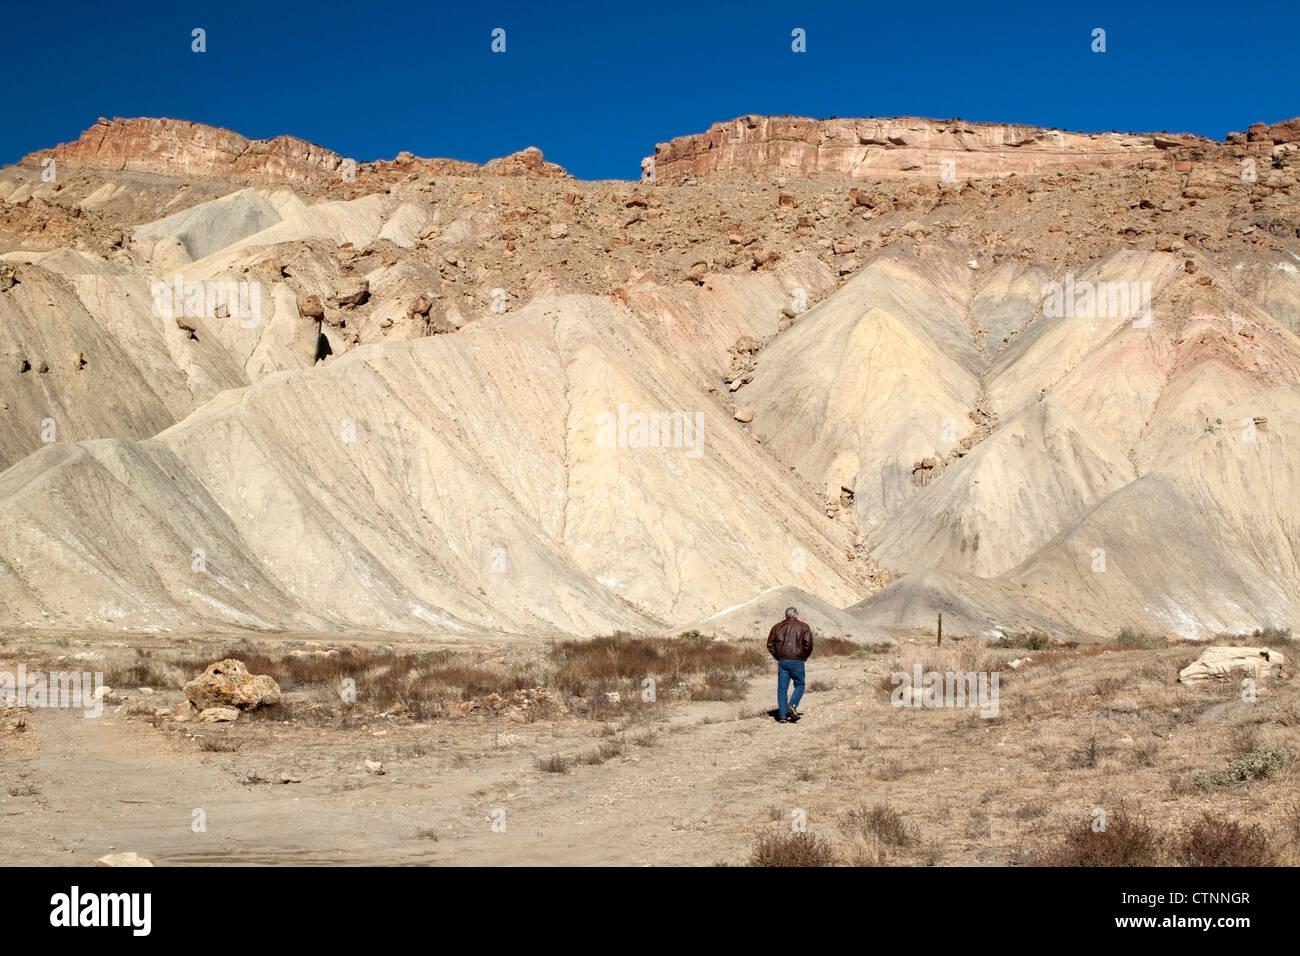 Walker on trail at base of Mt. Garfield, near Palisade, Colorado, USA - Stock Image